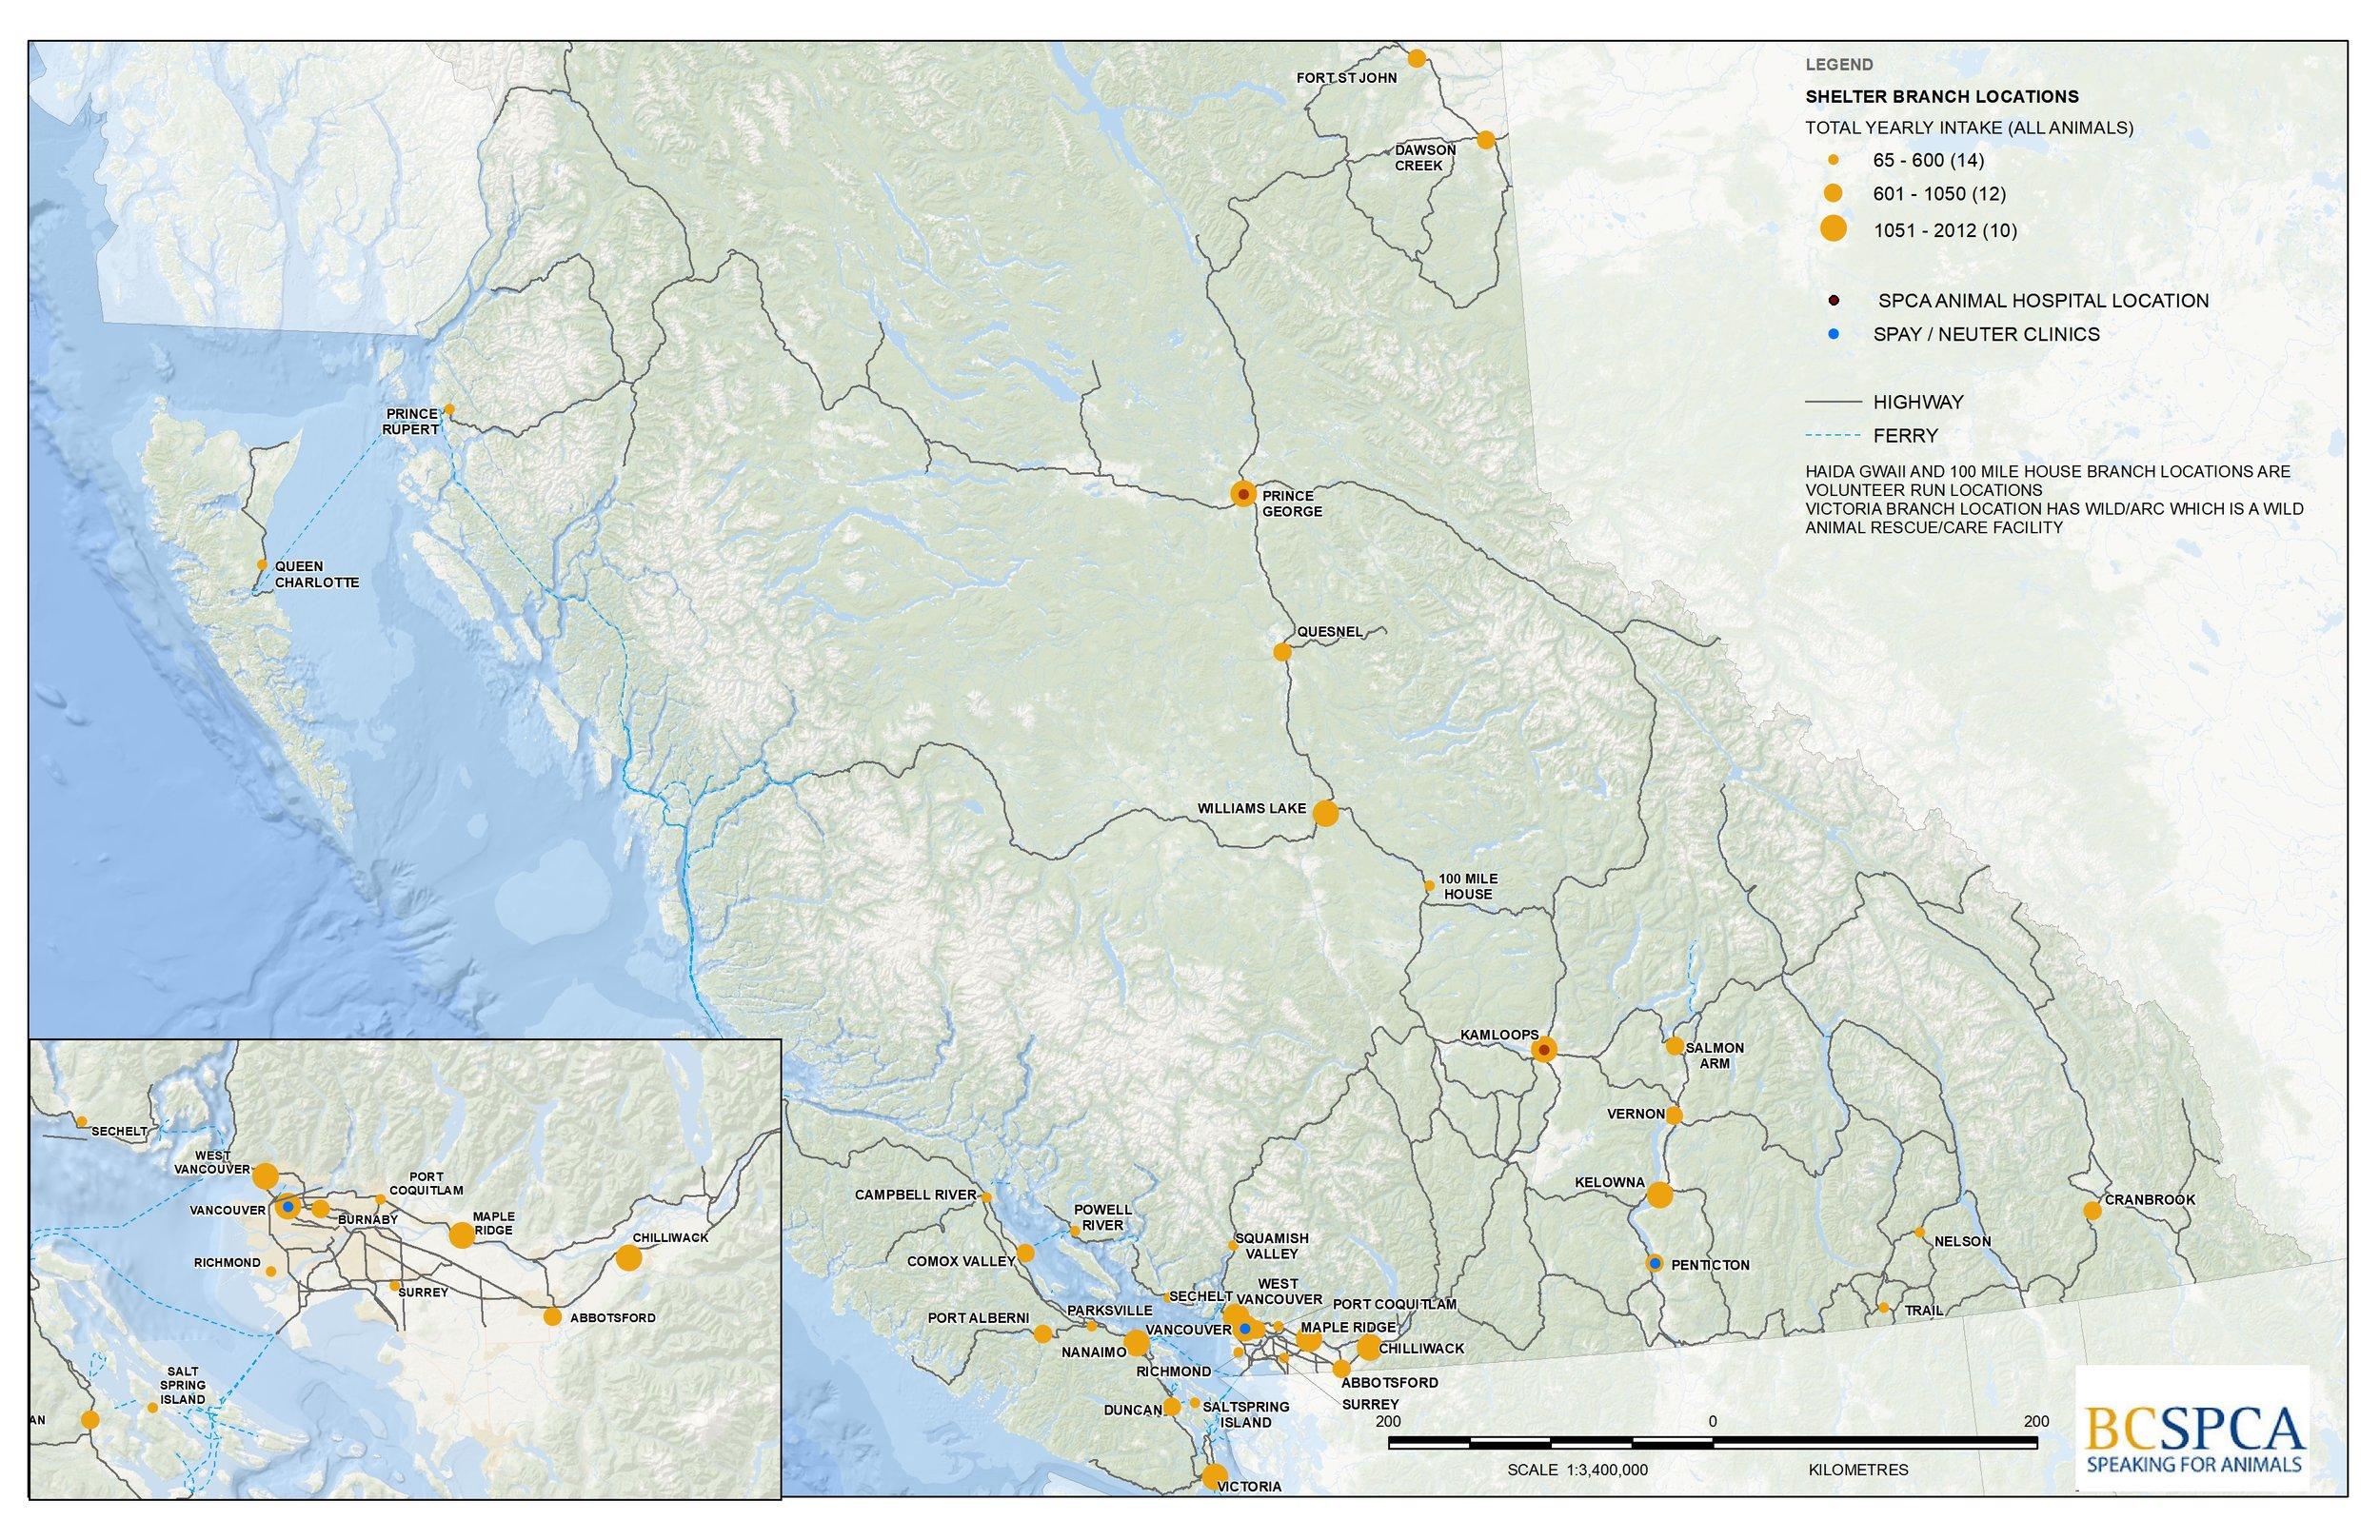 SPCA Locations in BC